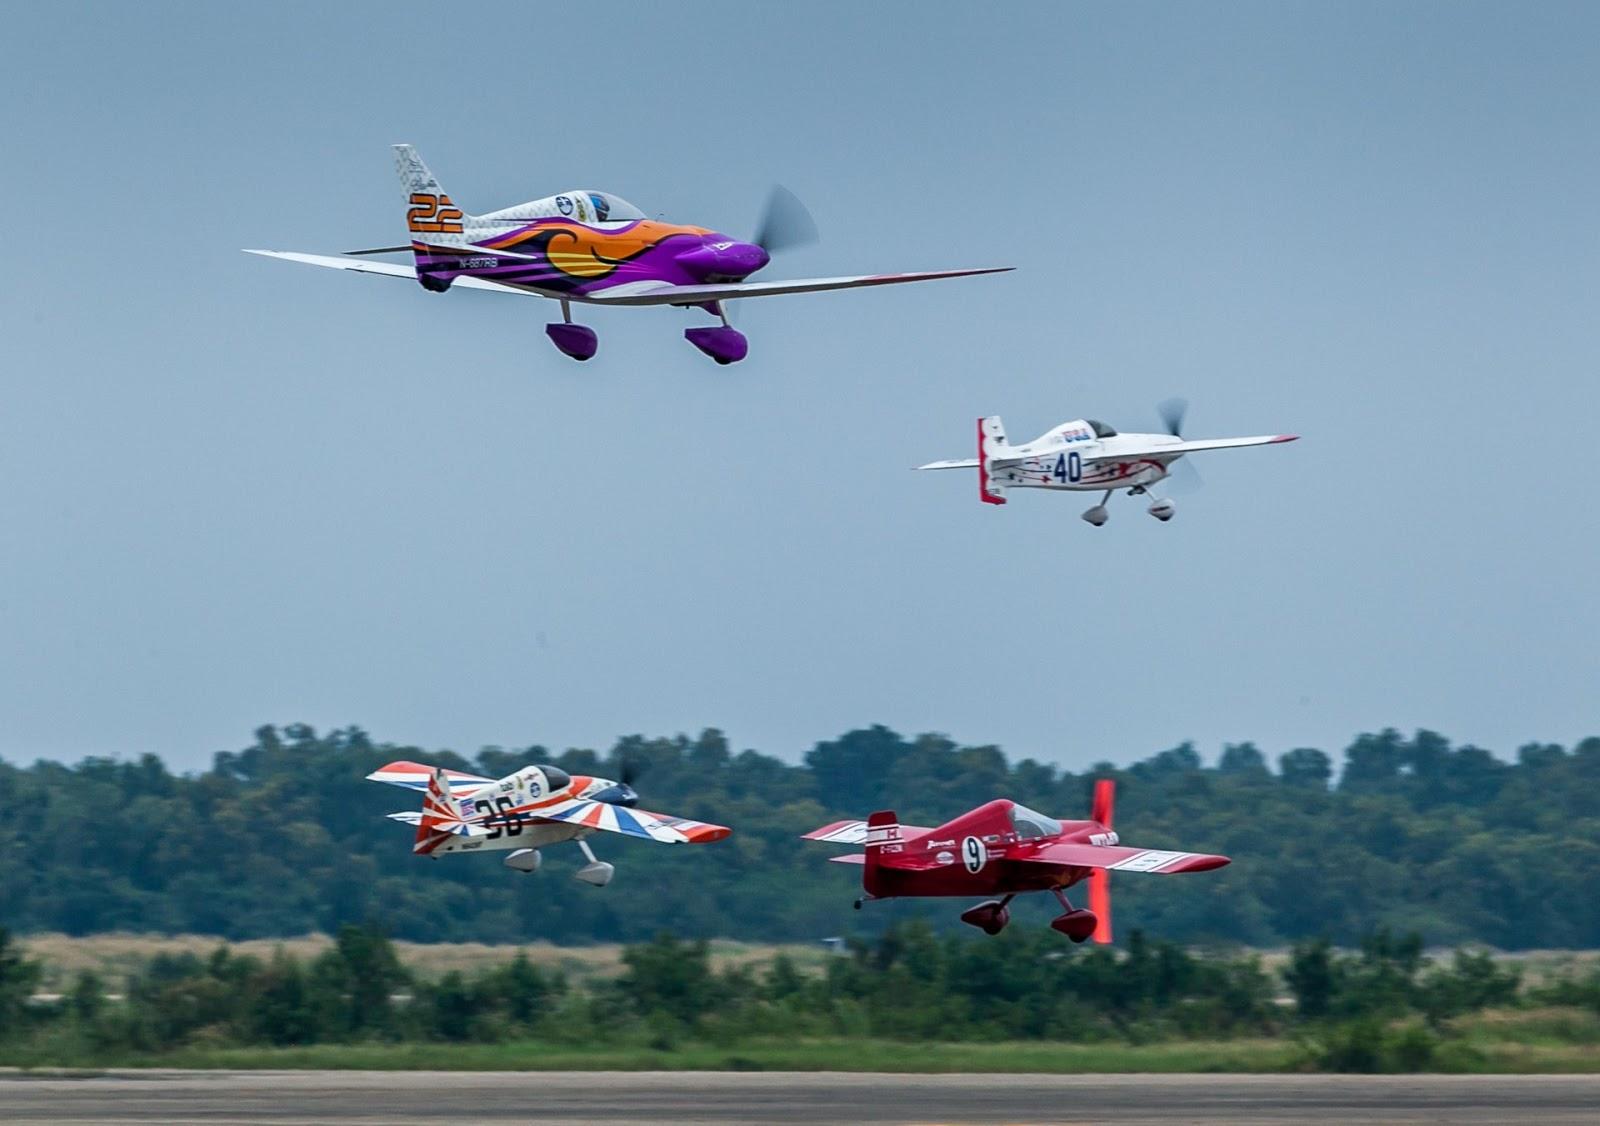 www Noticias-Aero info: Air Race 1 & Air Race Electric on